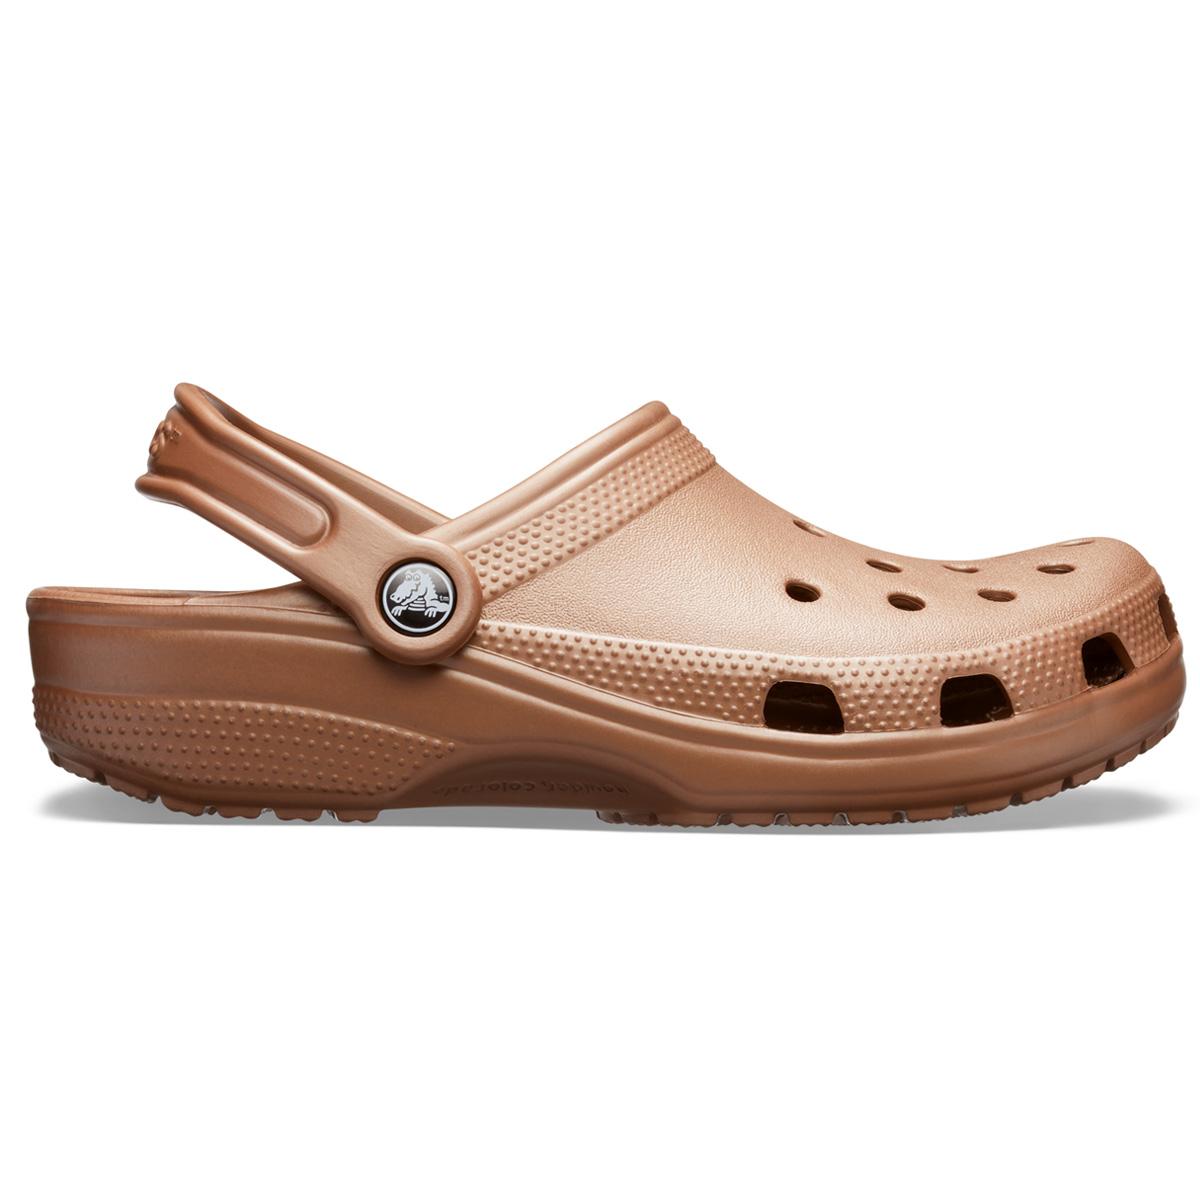 Crocs Classic - Bronz